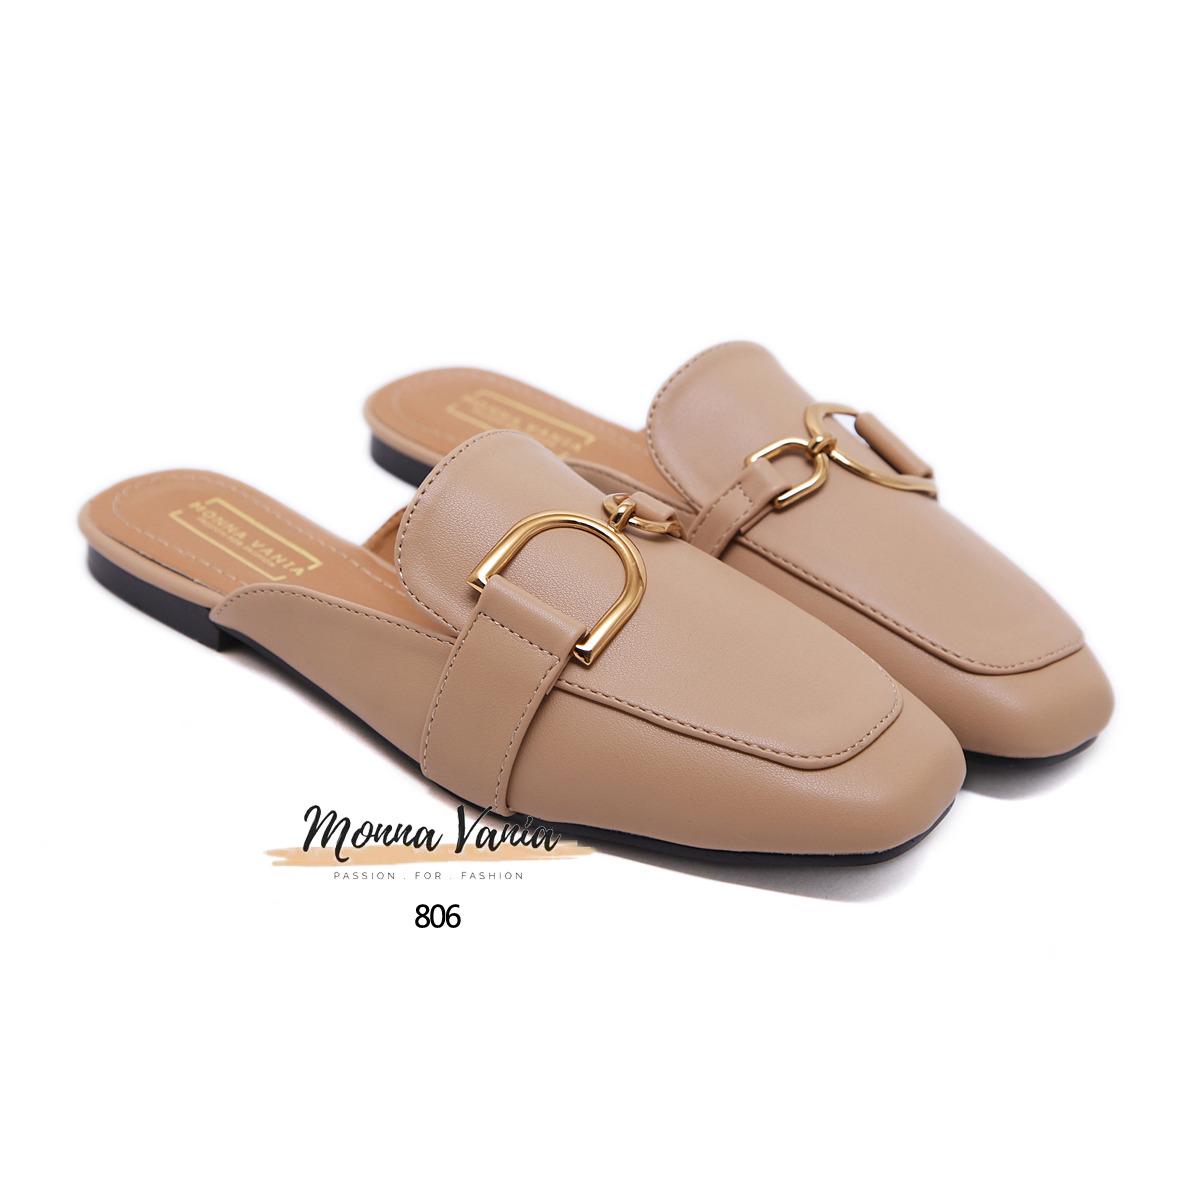 jual sepatu kw premium 2020 806H4 sepatu import murah,sepatu import wanita terbaru,sepatu import vietnam